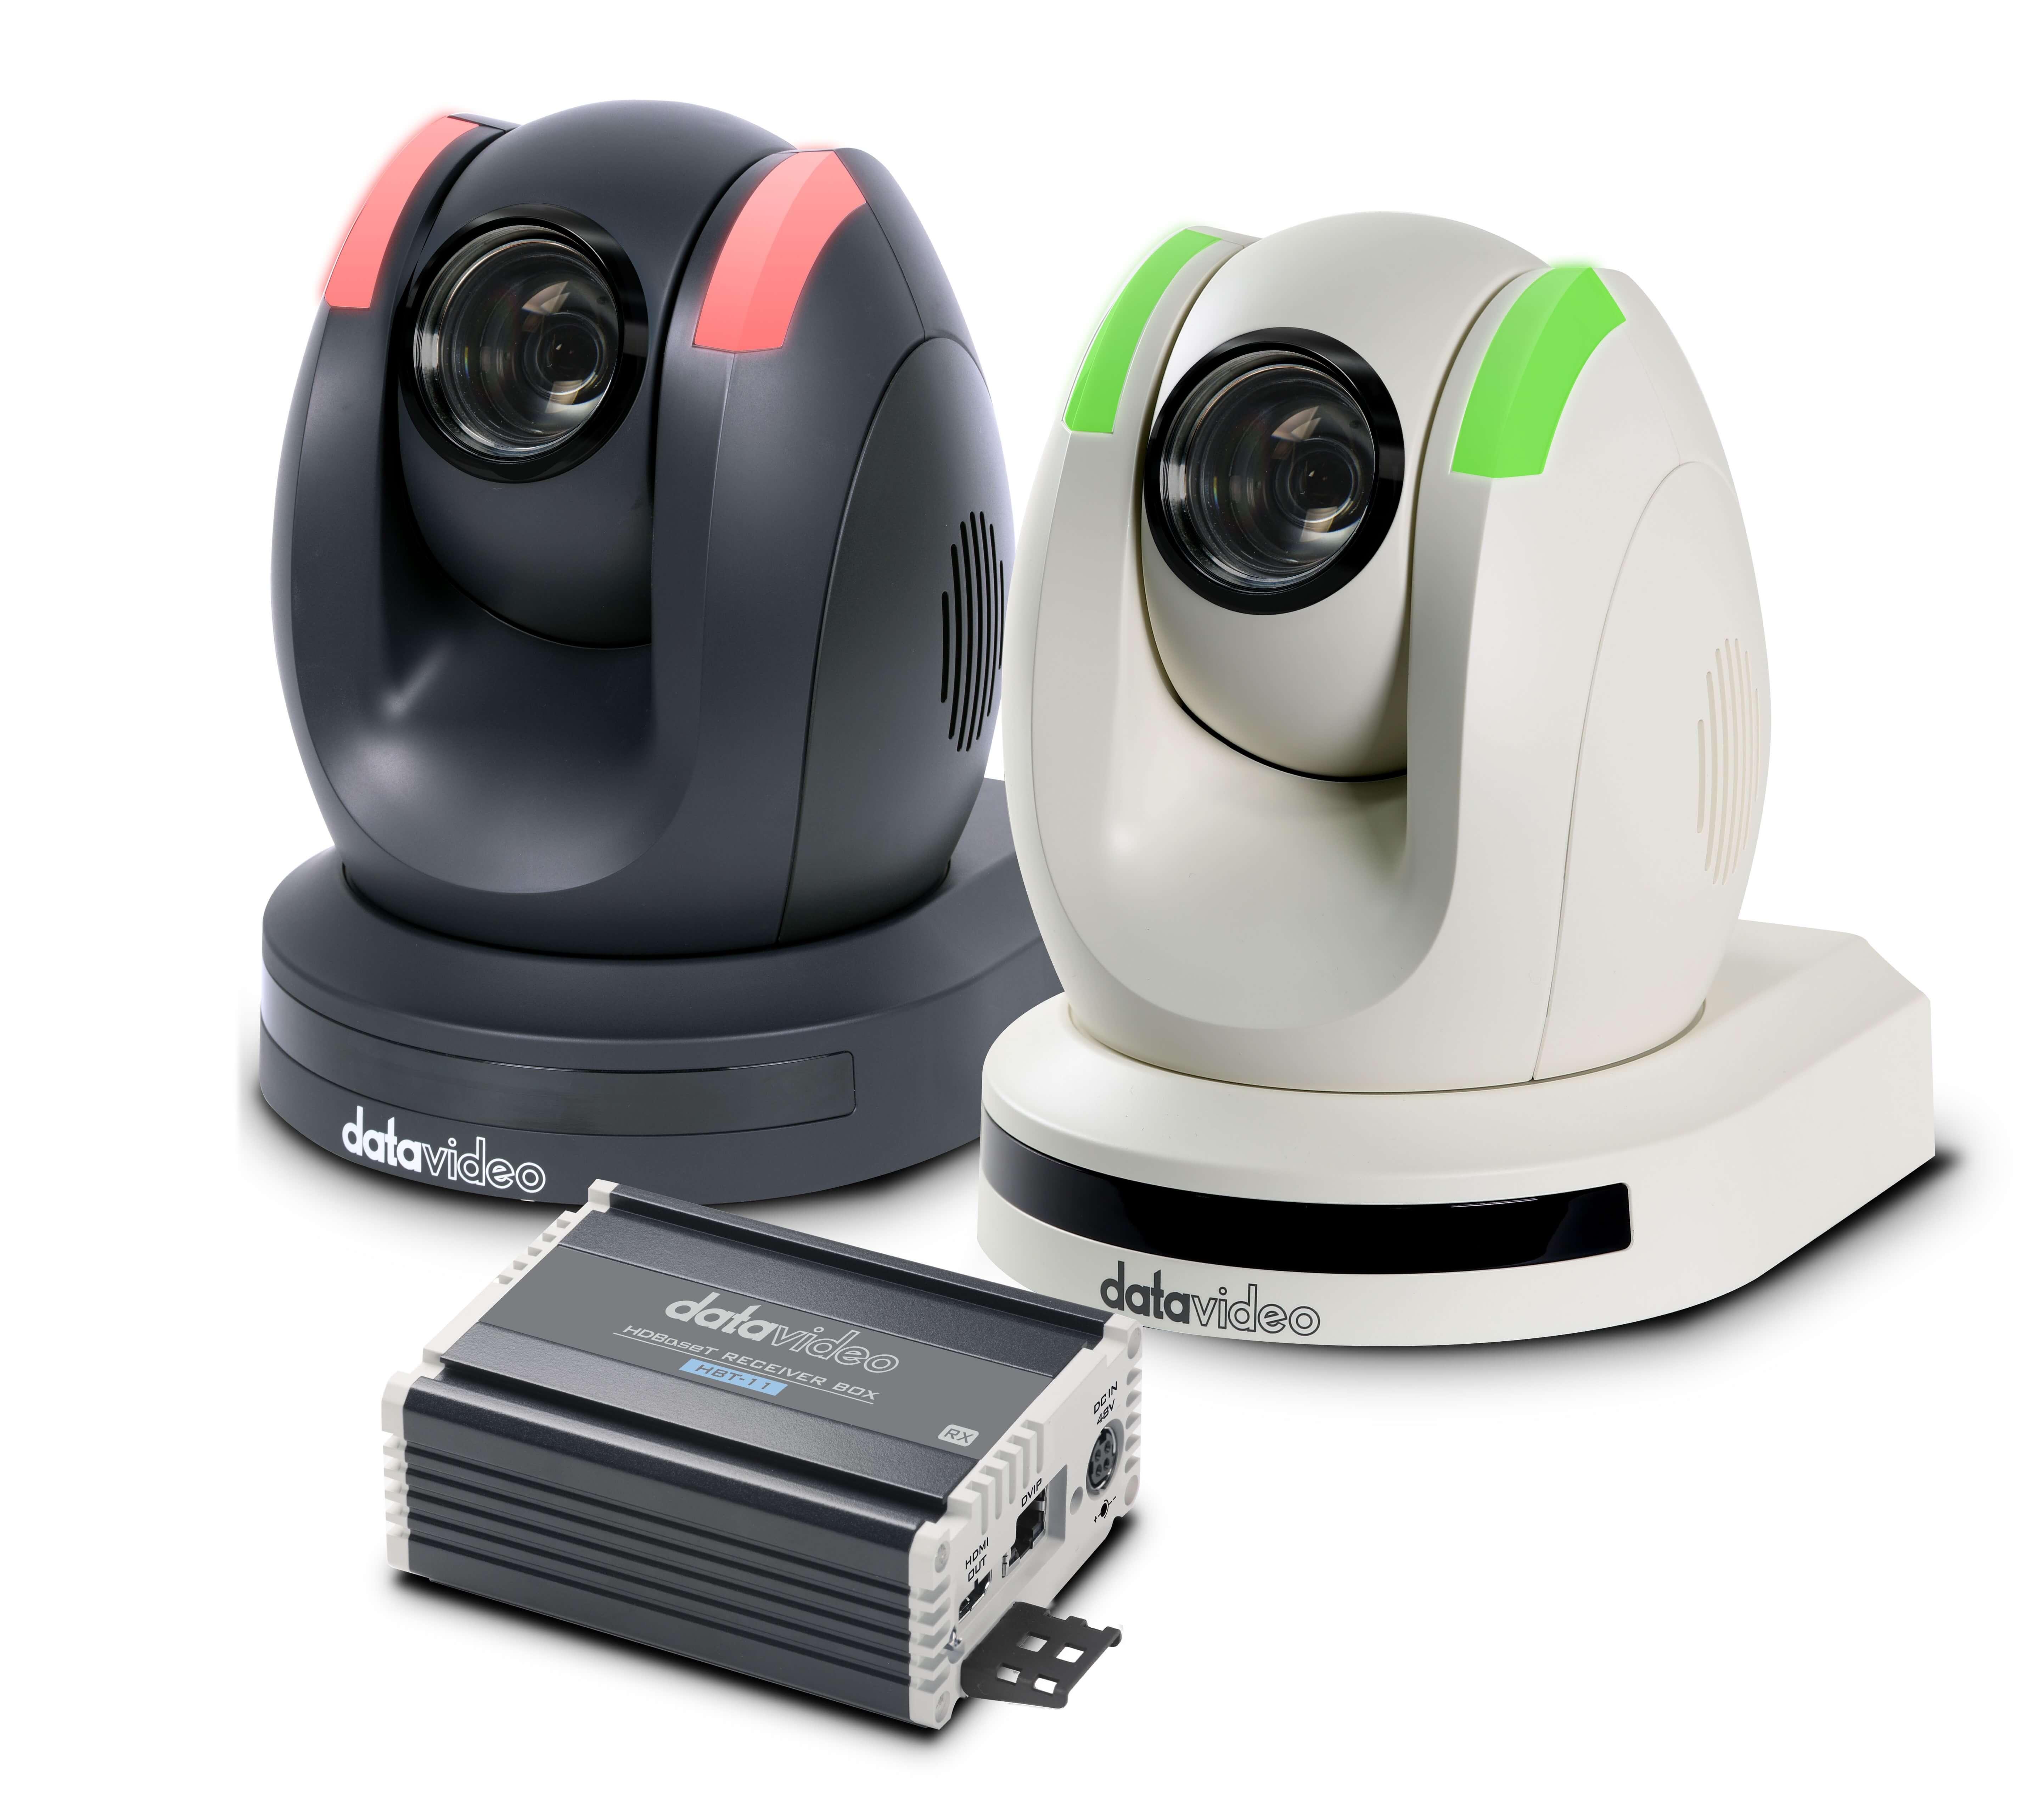 Datavideo PTC-150T